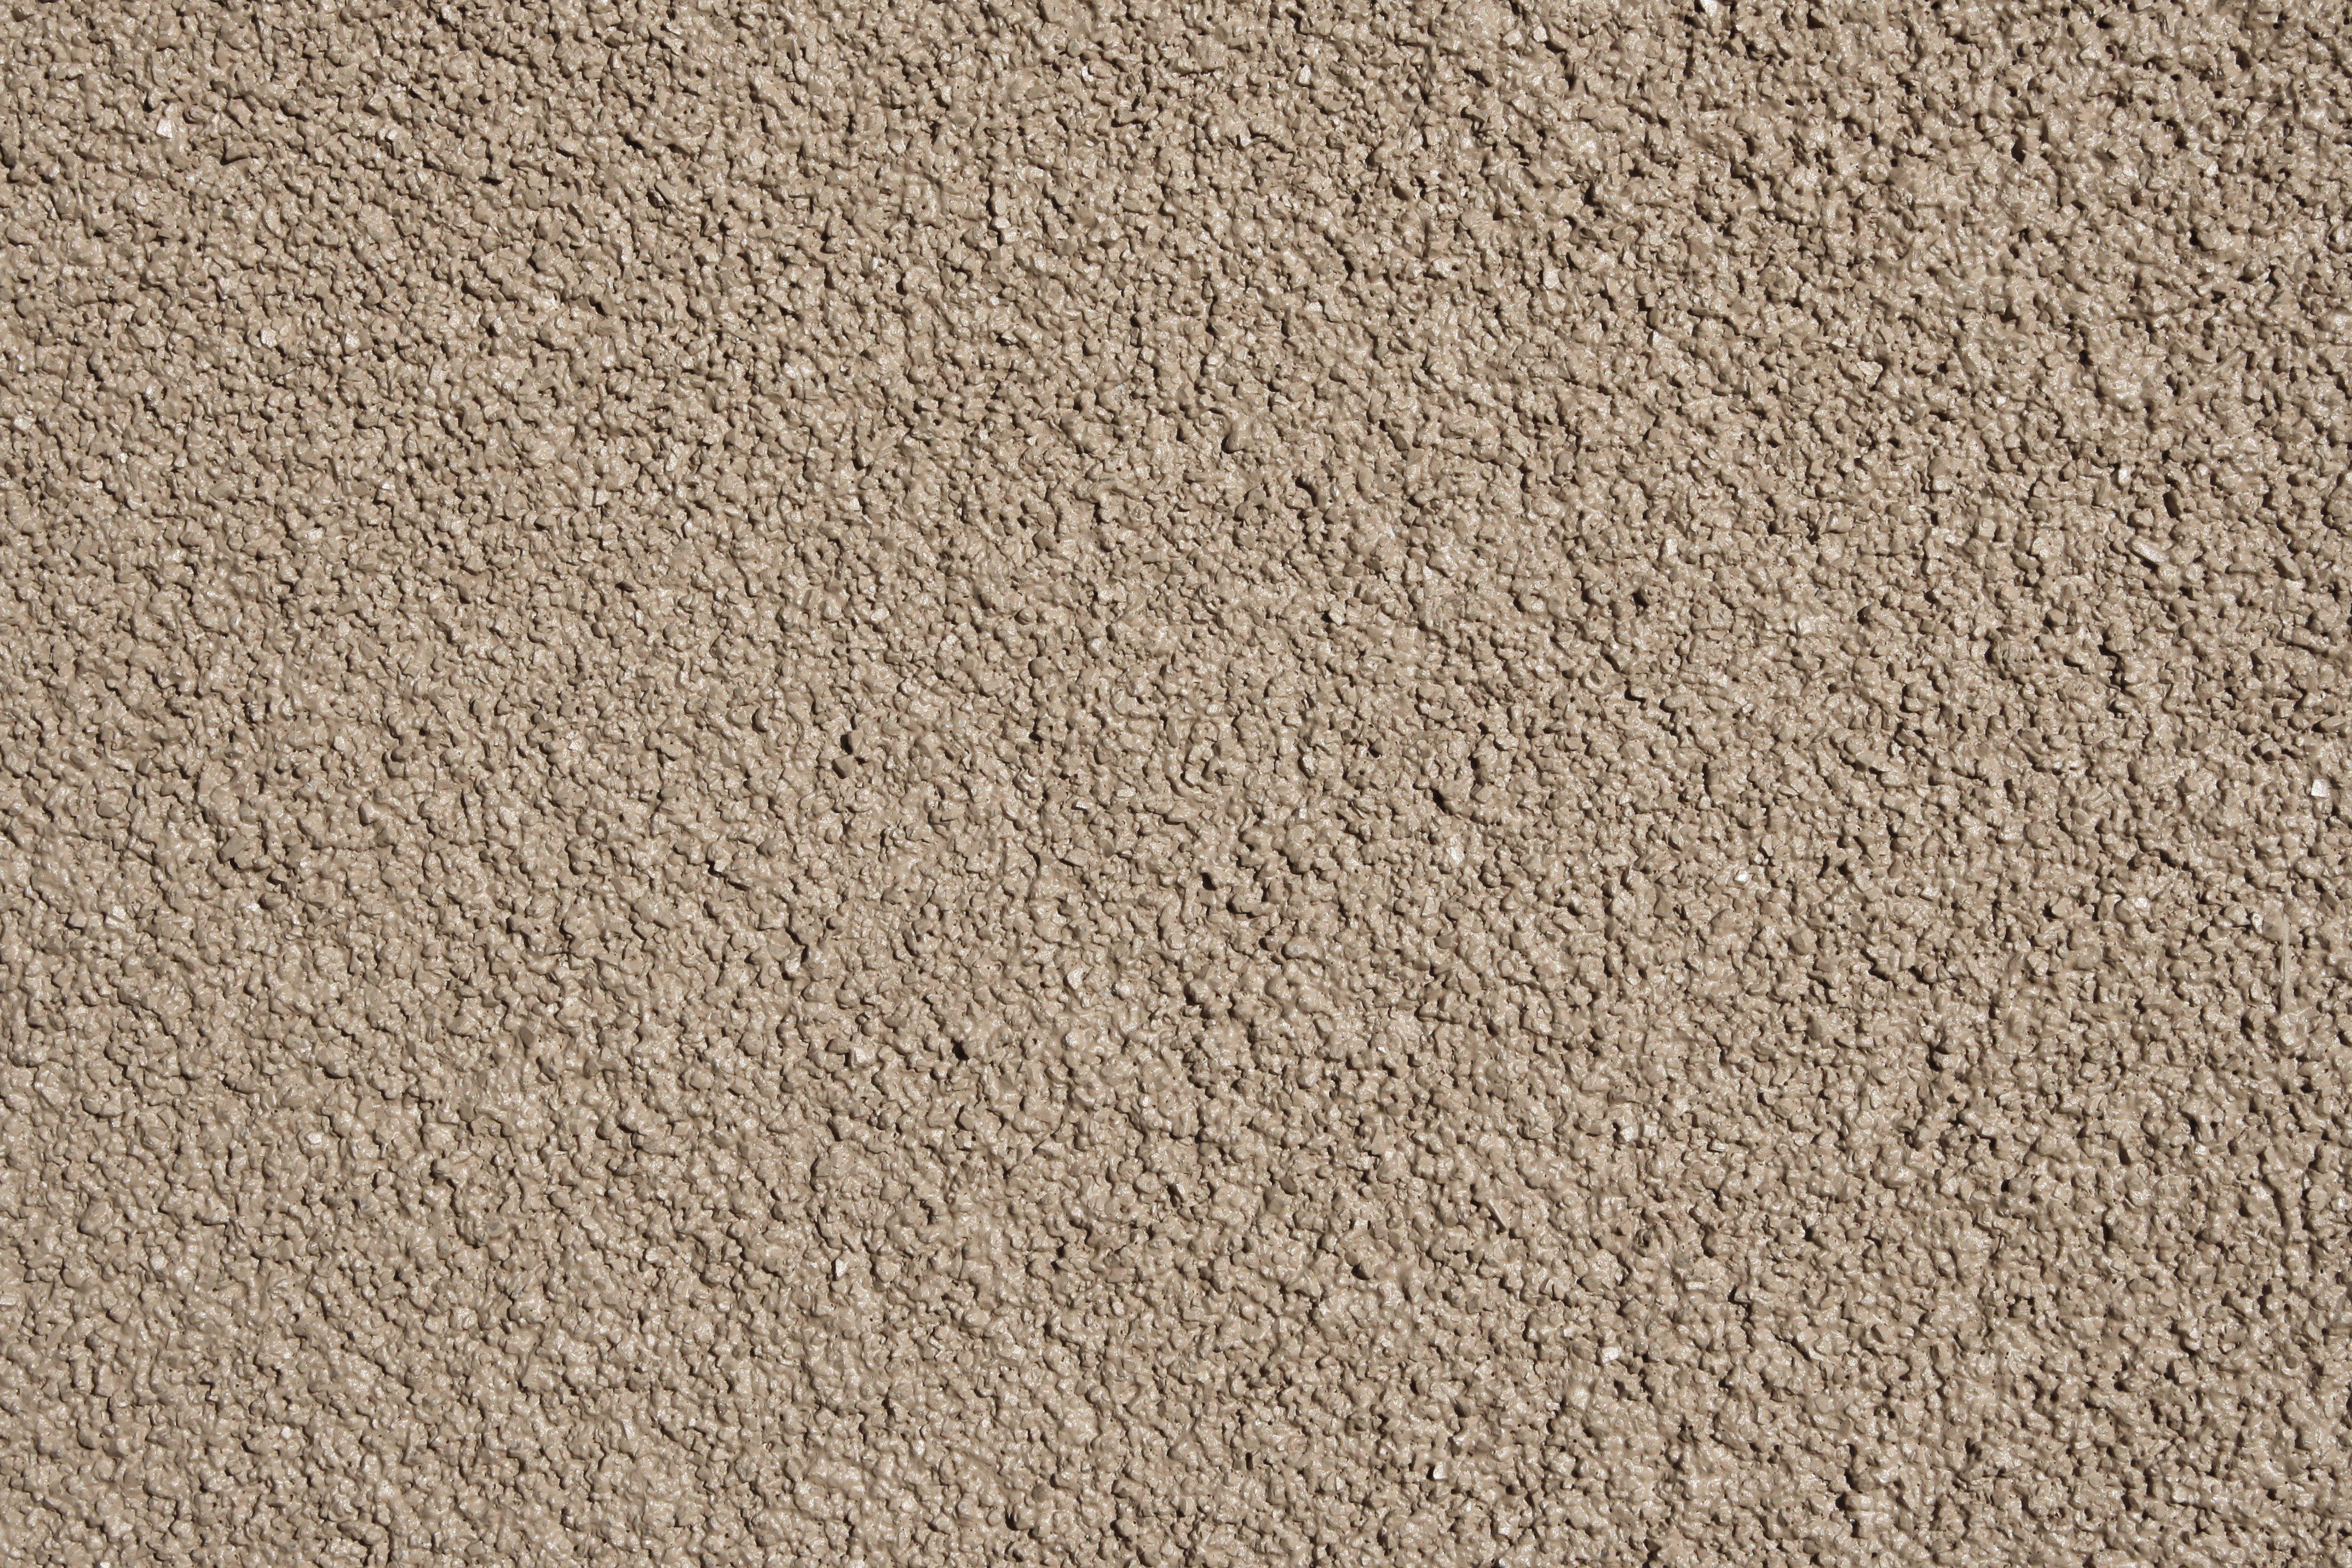 Beige Stucco Close Up Texture Picture Photograph Photos 3888x2592